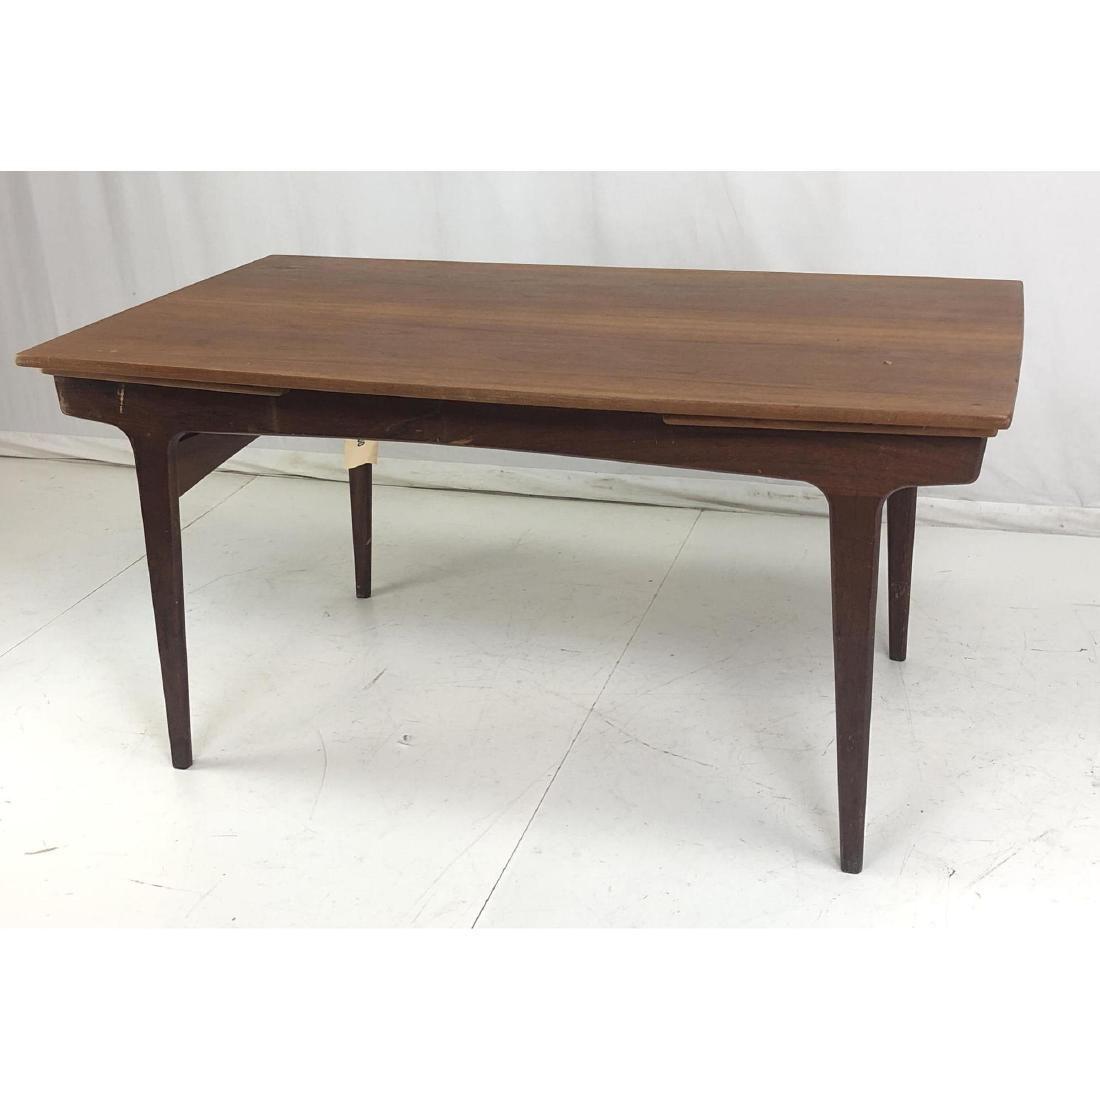 Danish Modern Teak Refractory Dining Table. Shape